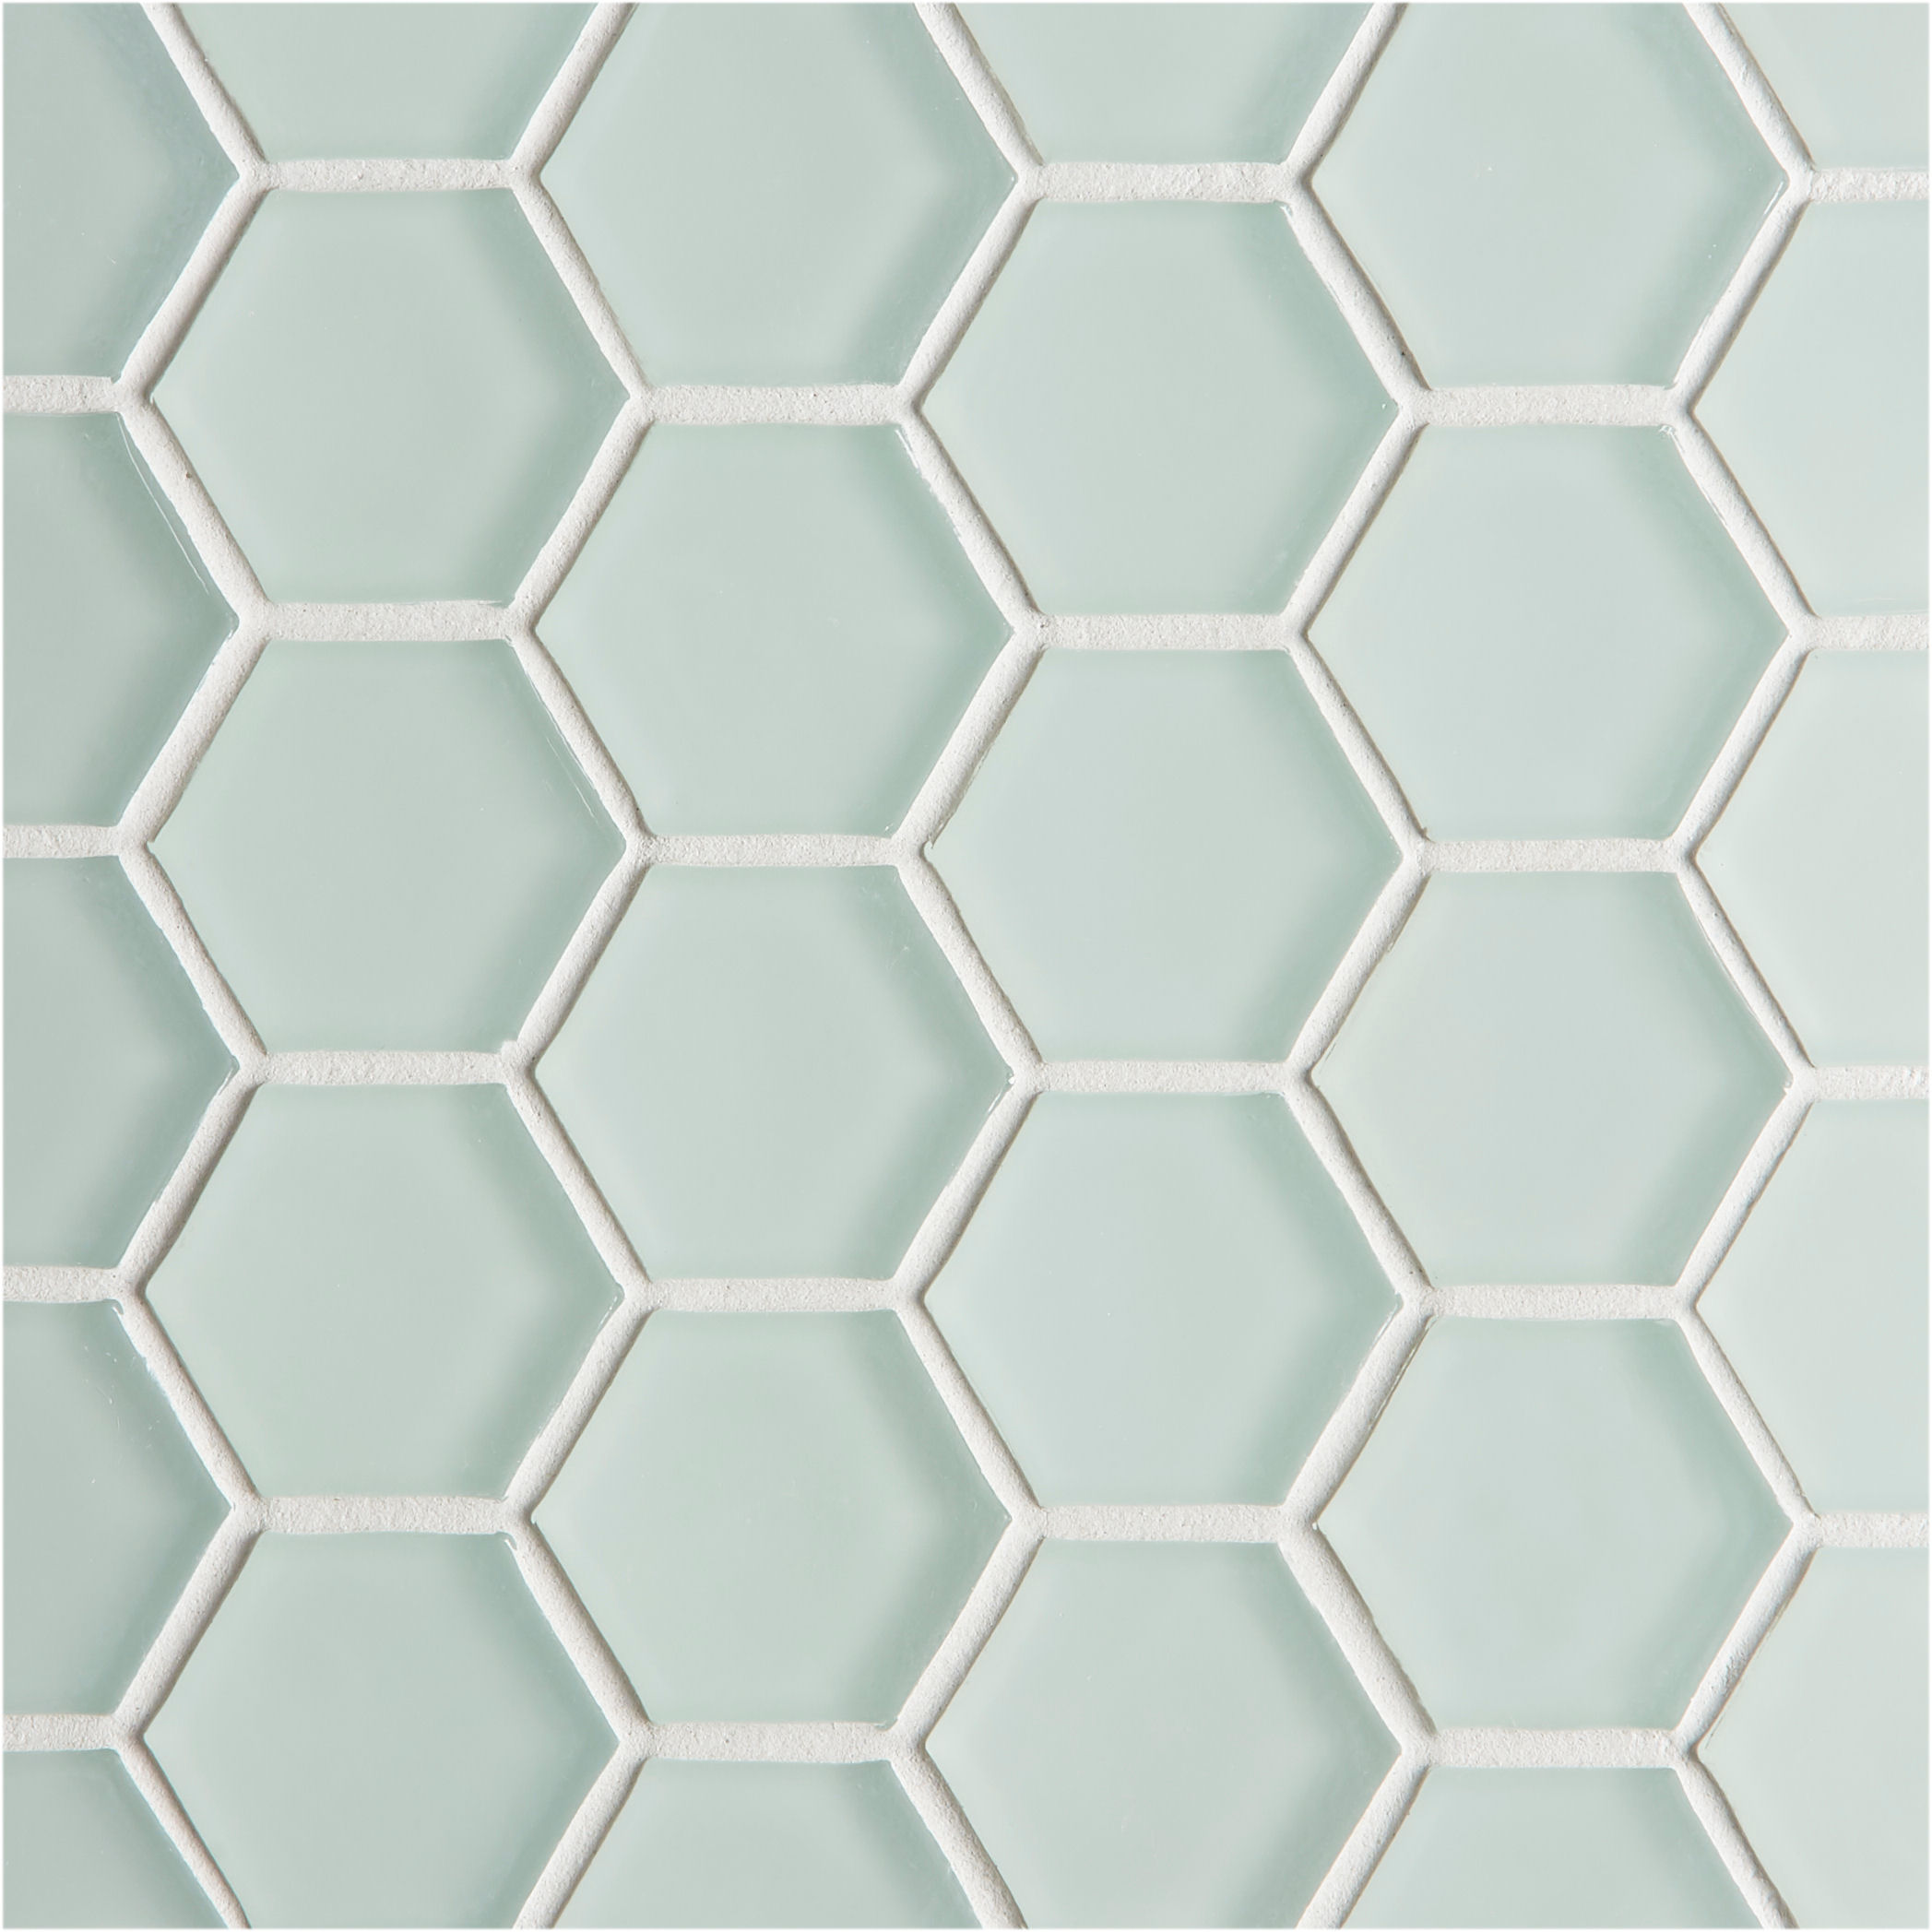 glacier light green glass hexagon mosaic tiles